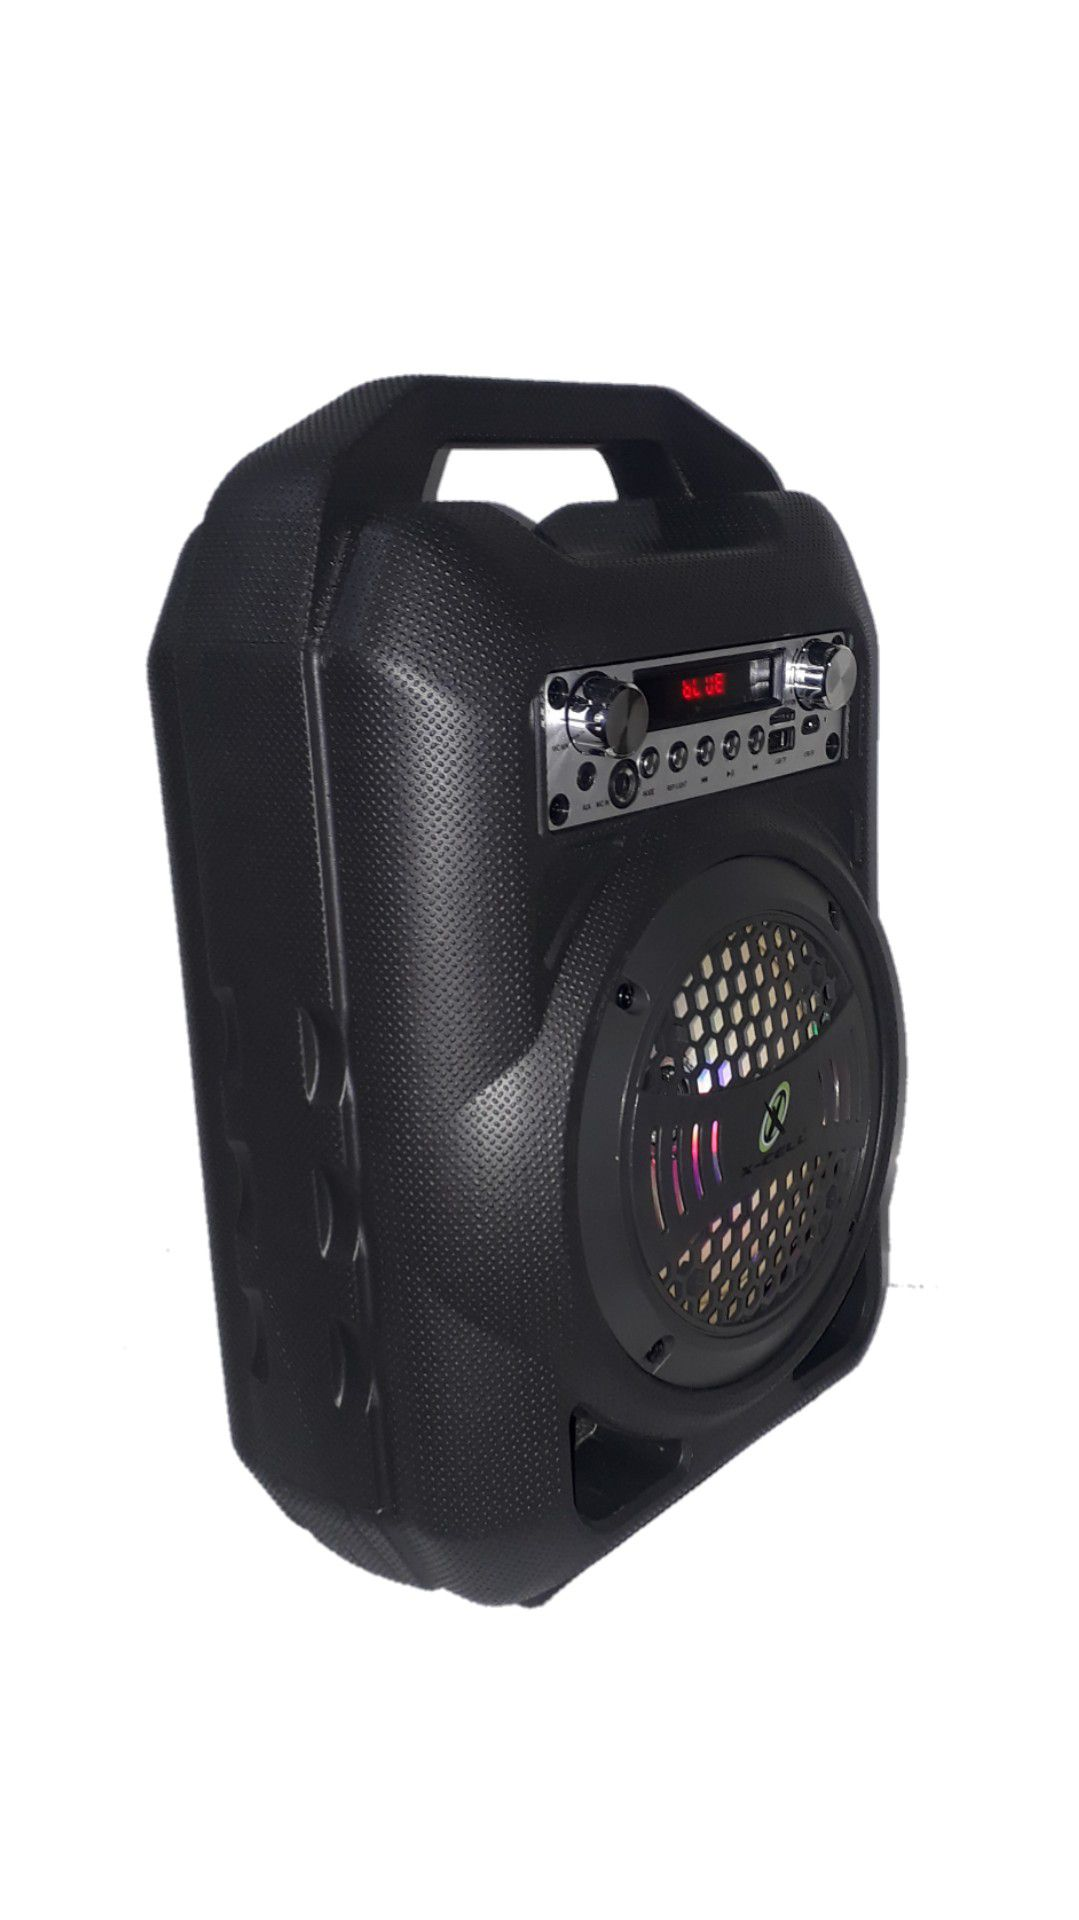 CAIXA AMPLIFICADA XCELL XCCP30 BLUETOOTH USB/SD/FM,1MICROFONE.1AUXILIAR P2,1CANALP10,1FALANTE,  PRETA